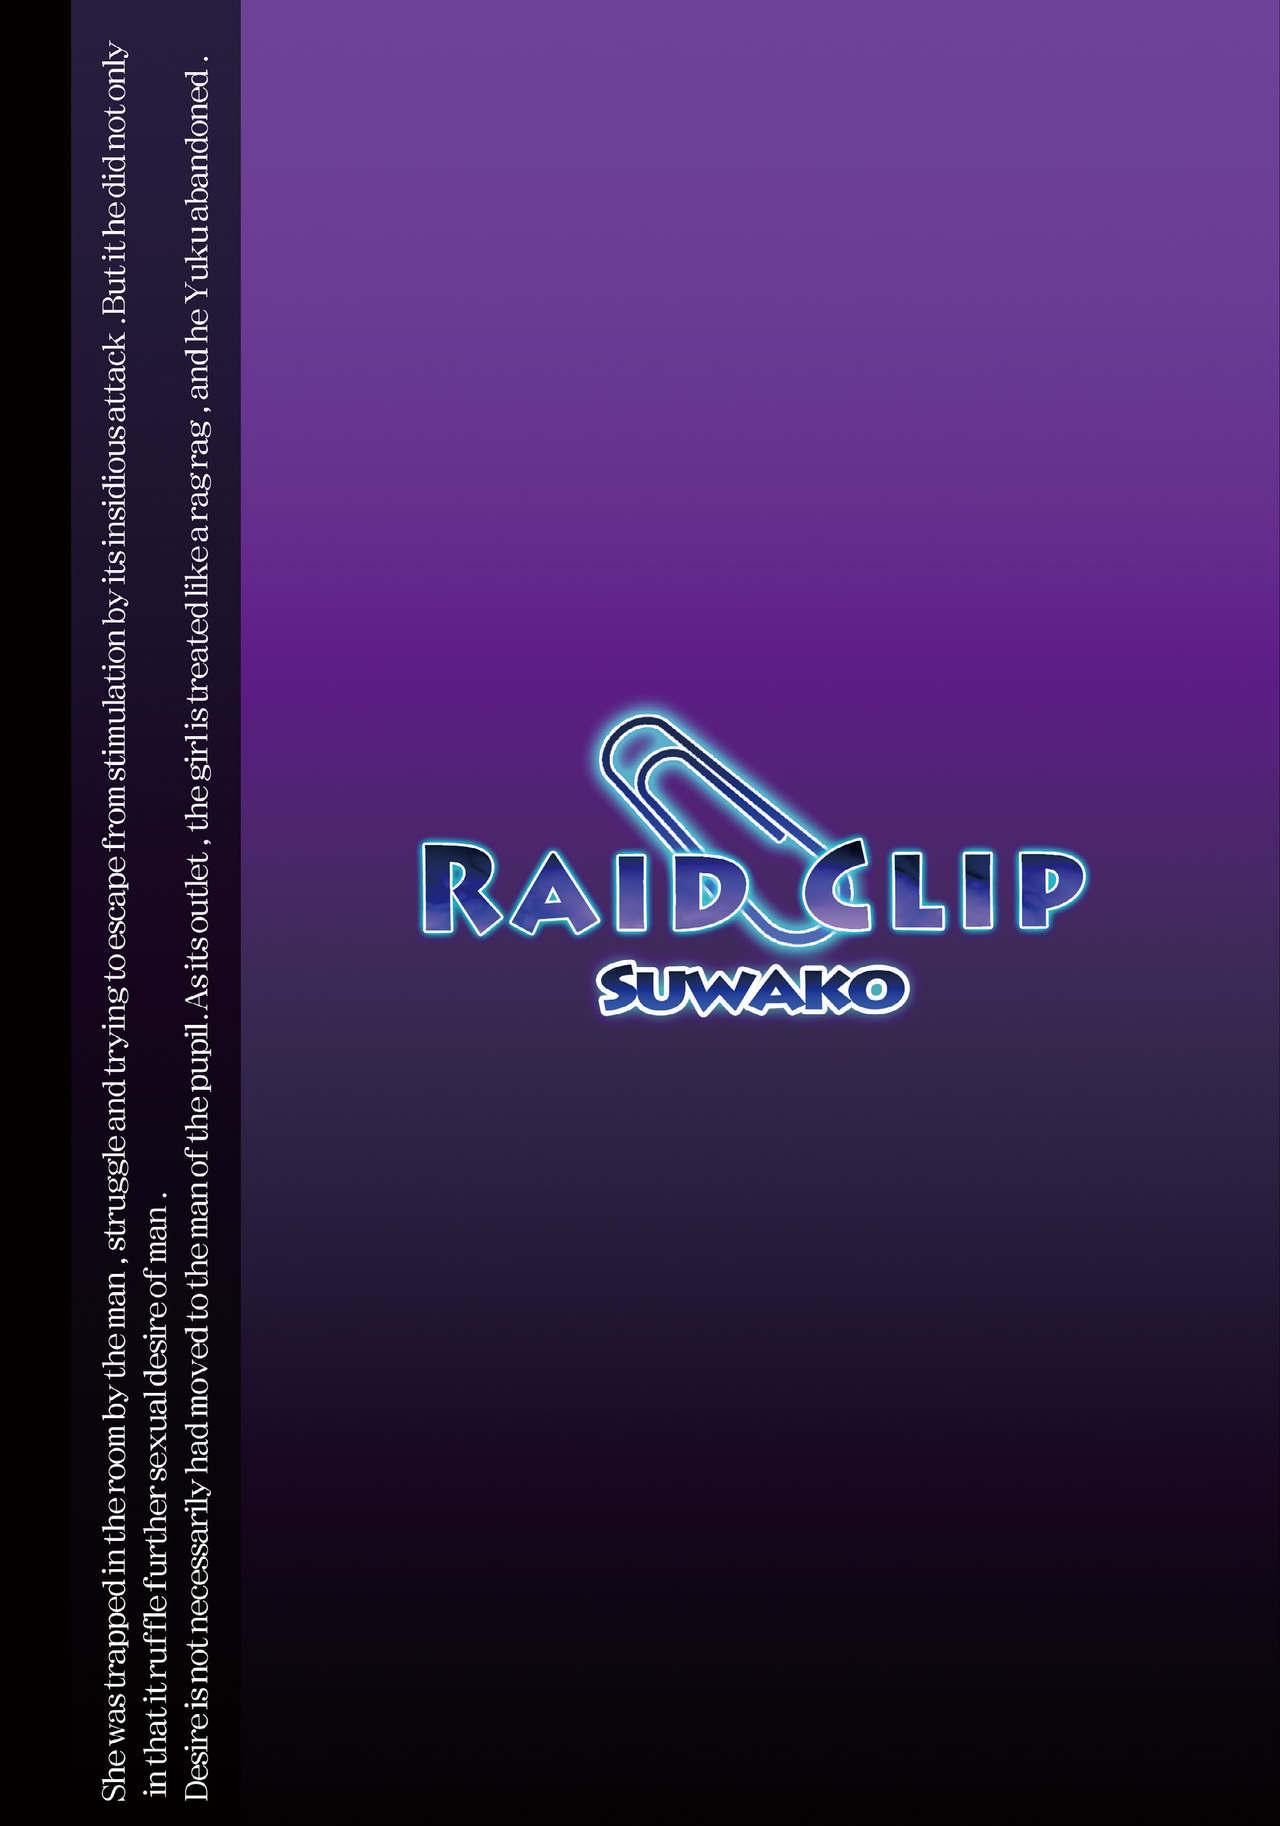 RAID CLIP SUWAKO 17